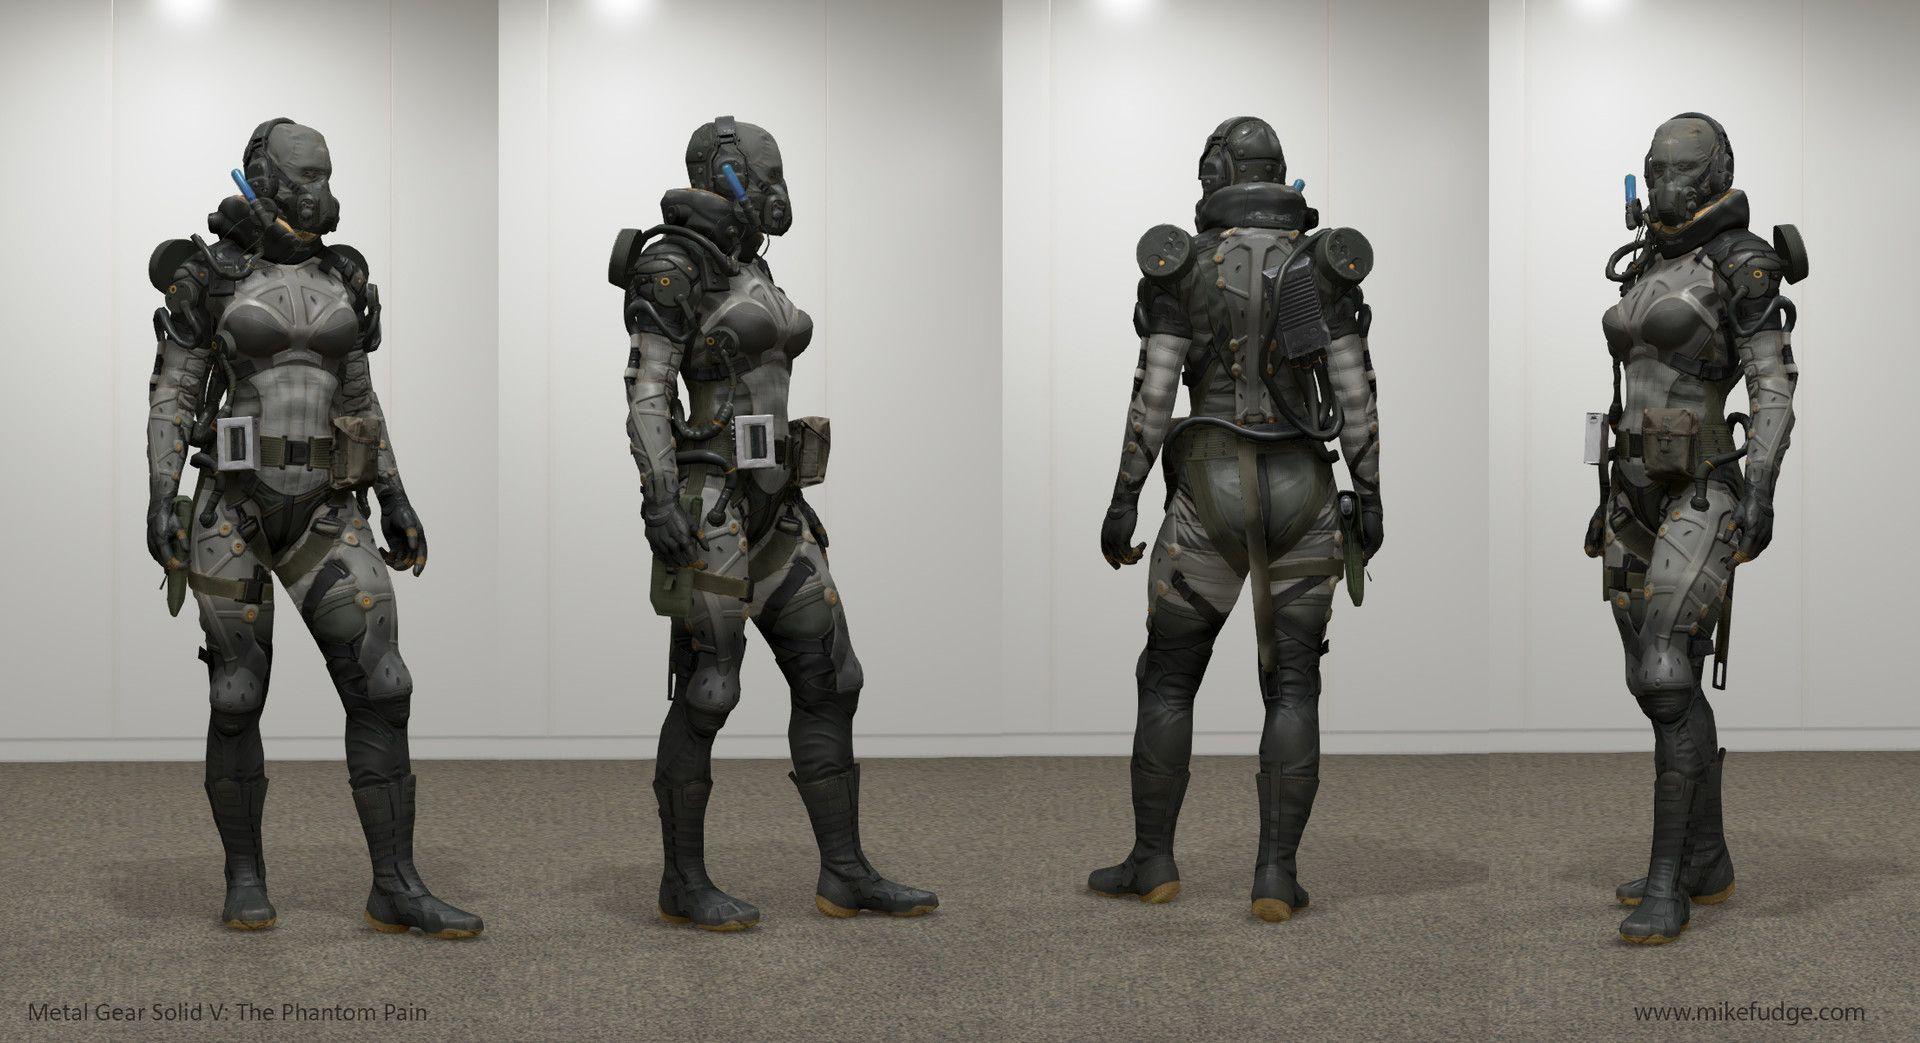 ArtStation - Metal Gear Solid V: The Phantom Pain - Snake